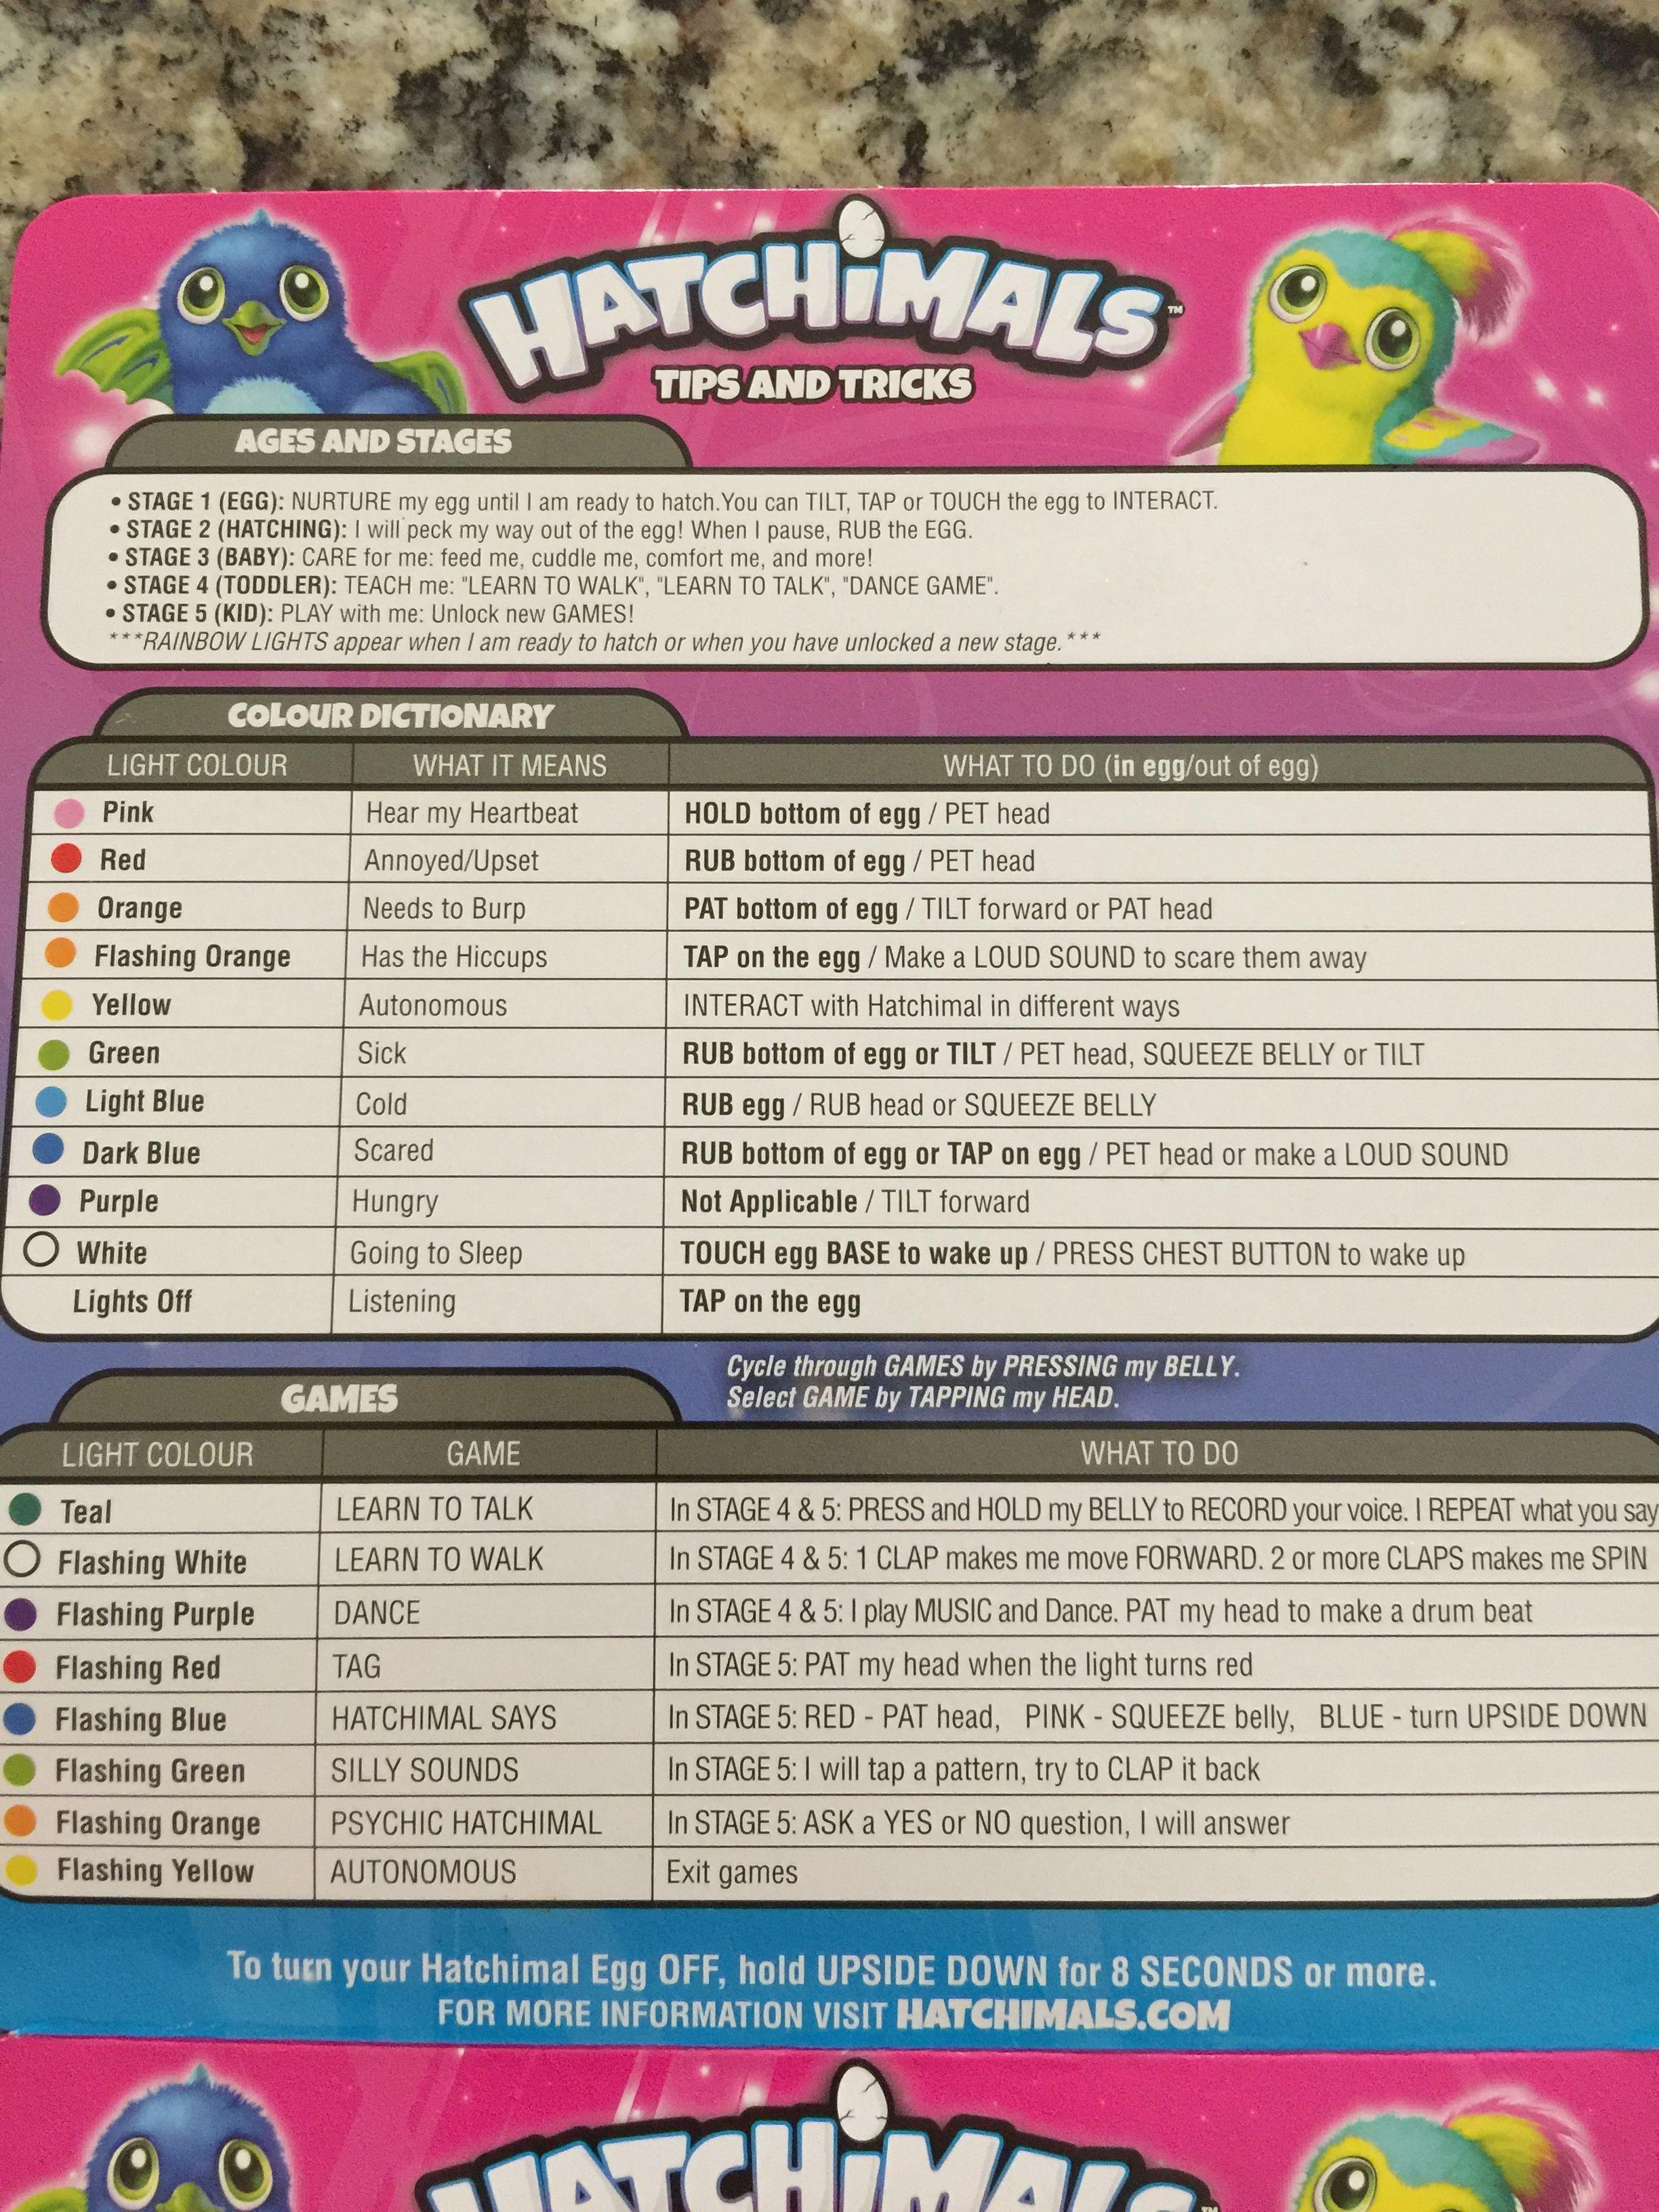 Hatchimals Tips and Tricks Guide Hatchimals, Toddler